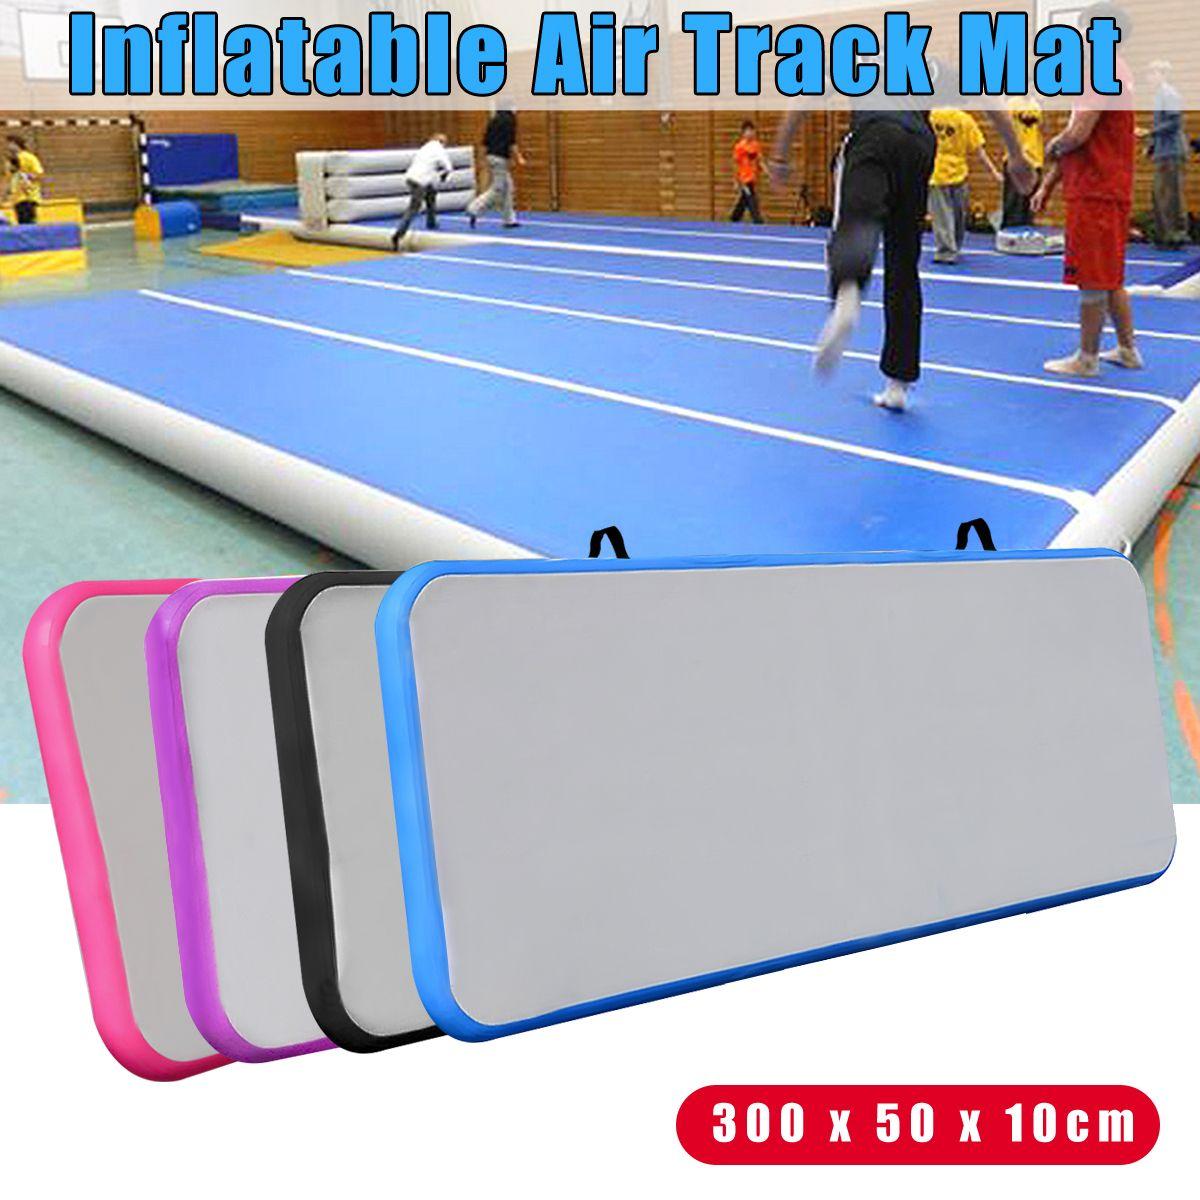 118x19x3,93 zoll Outdoor Air Track Aufblasbare Gym Yoga Mat Praxis Taumeln Boden Gymnastik Pad Rosa/ schwarz/Lila/Blau